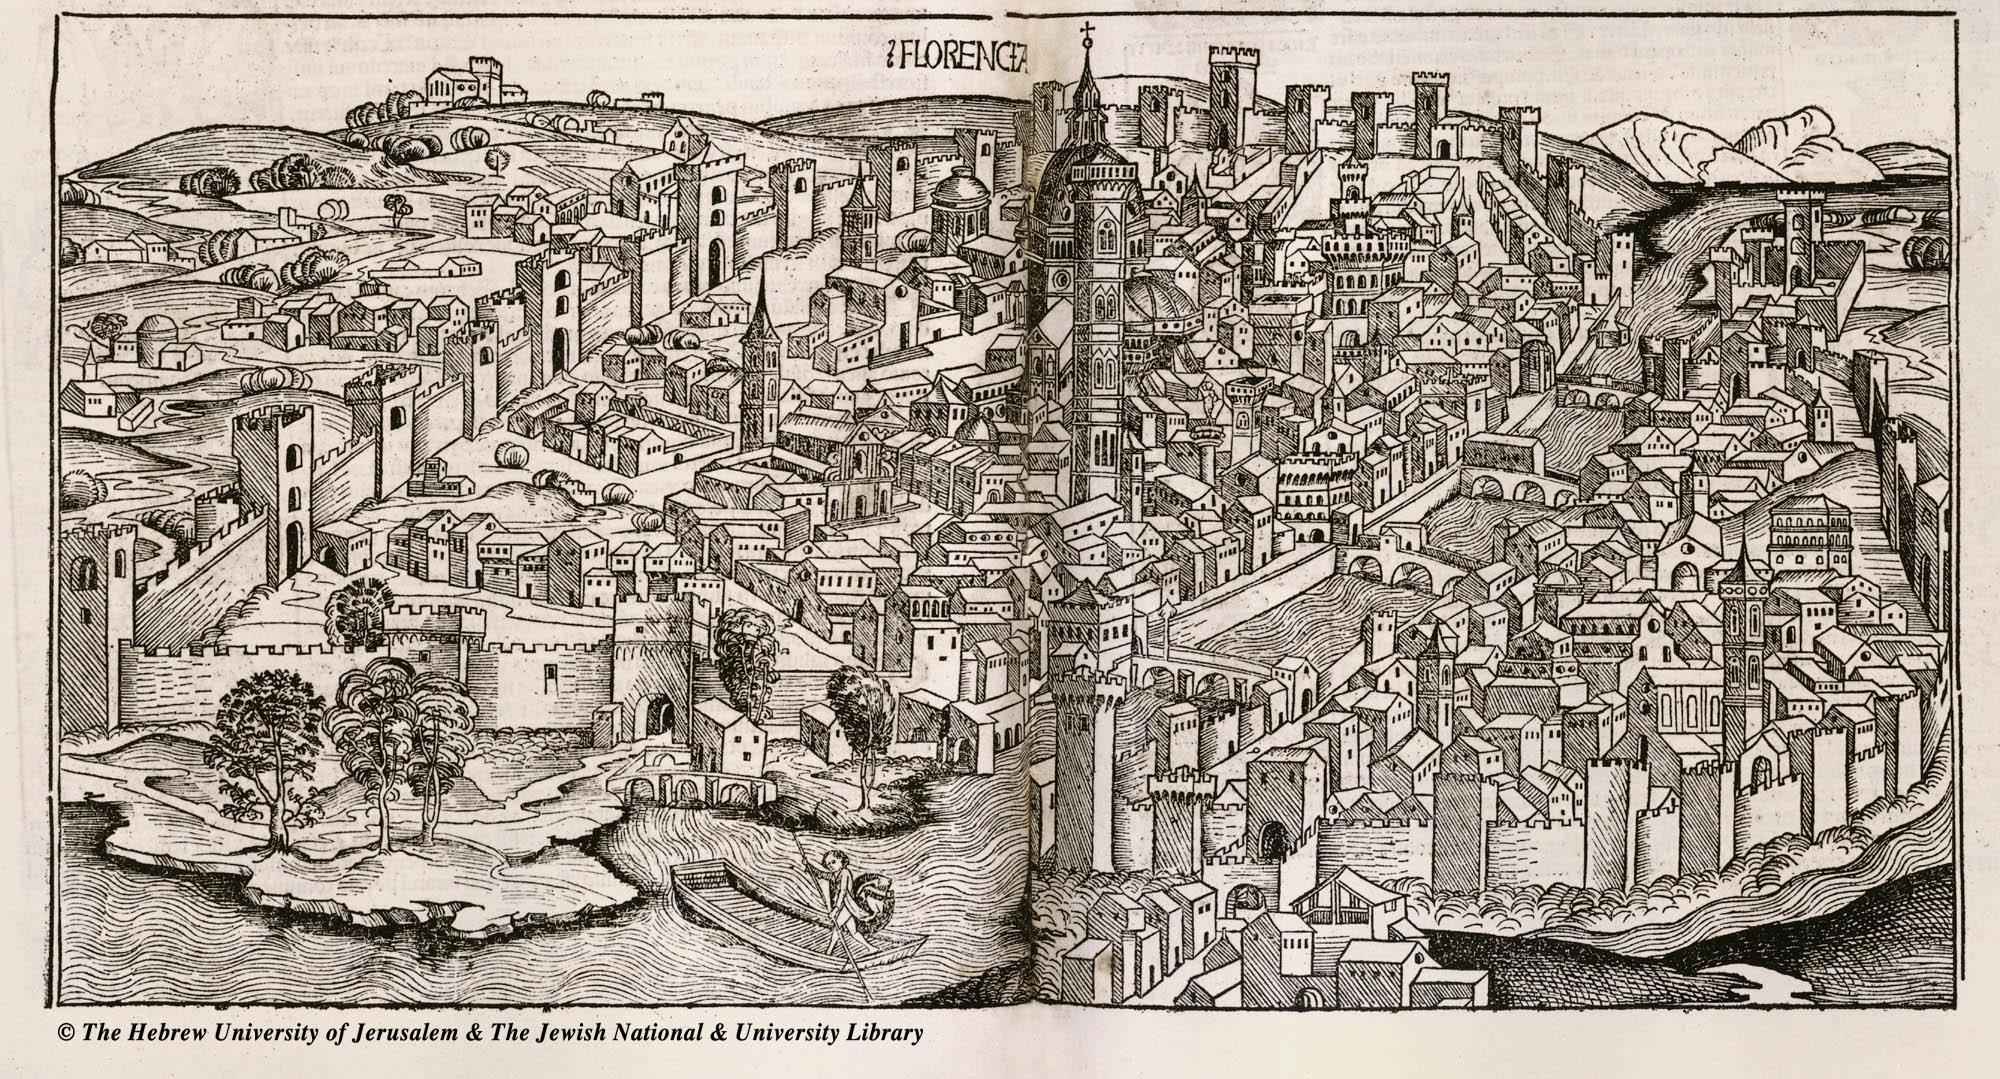 Italian Florence: Trombone History: 15th Century